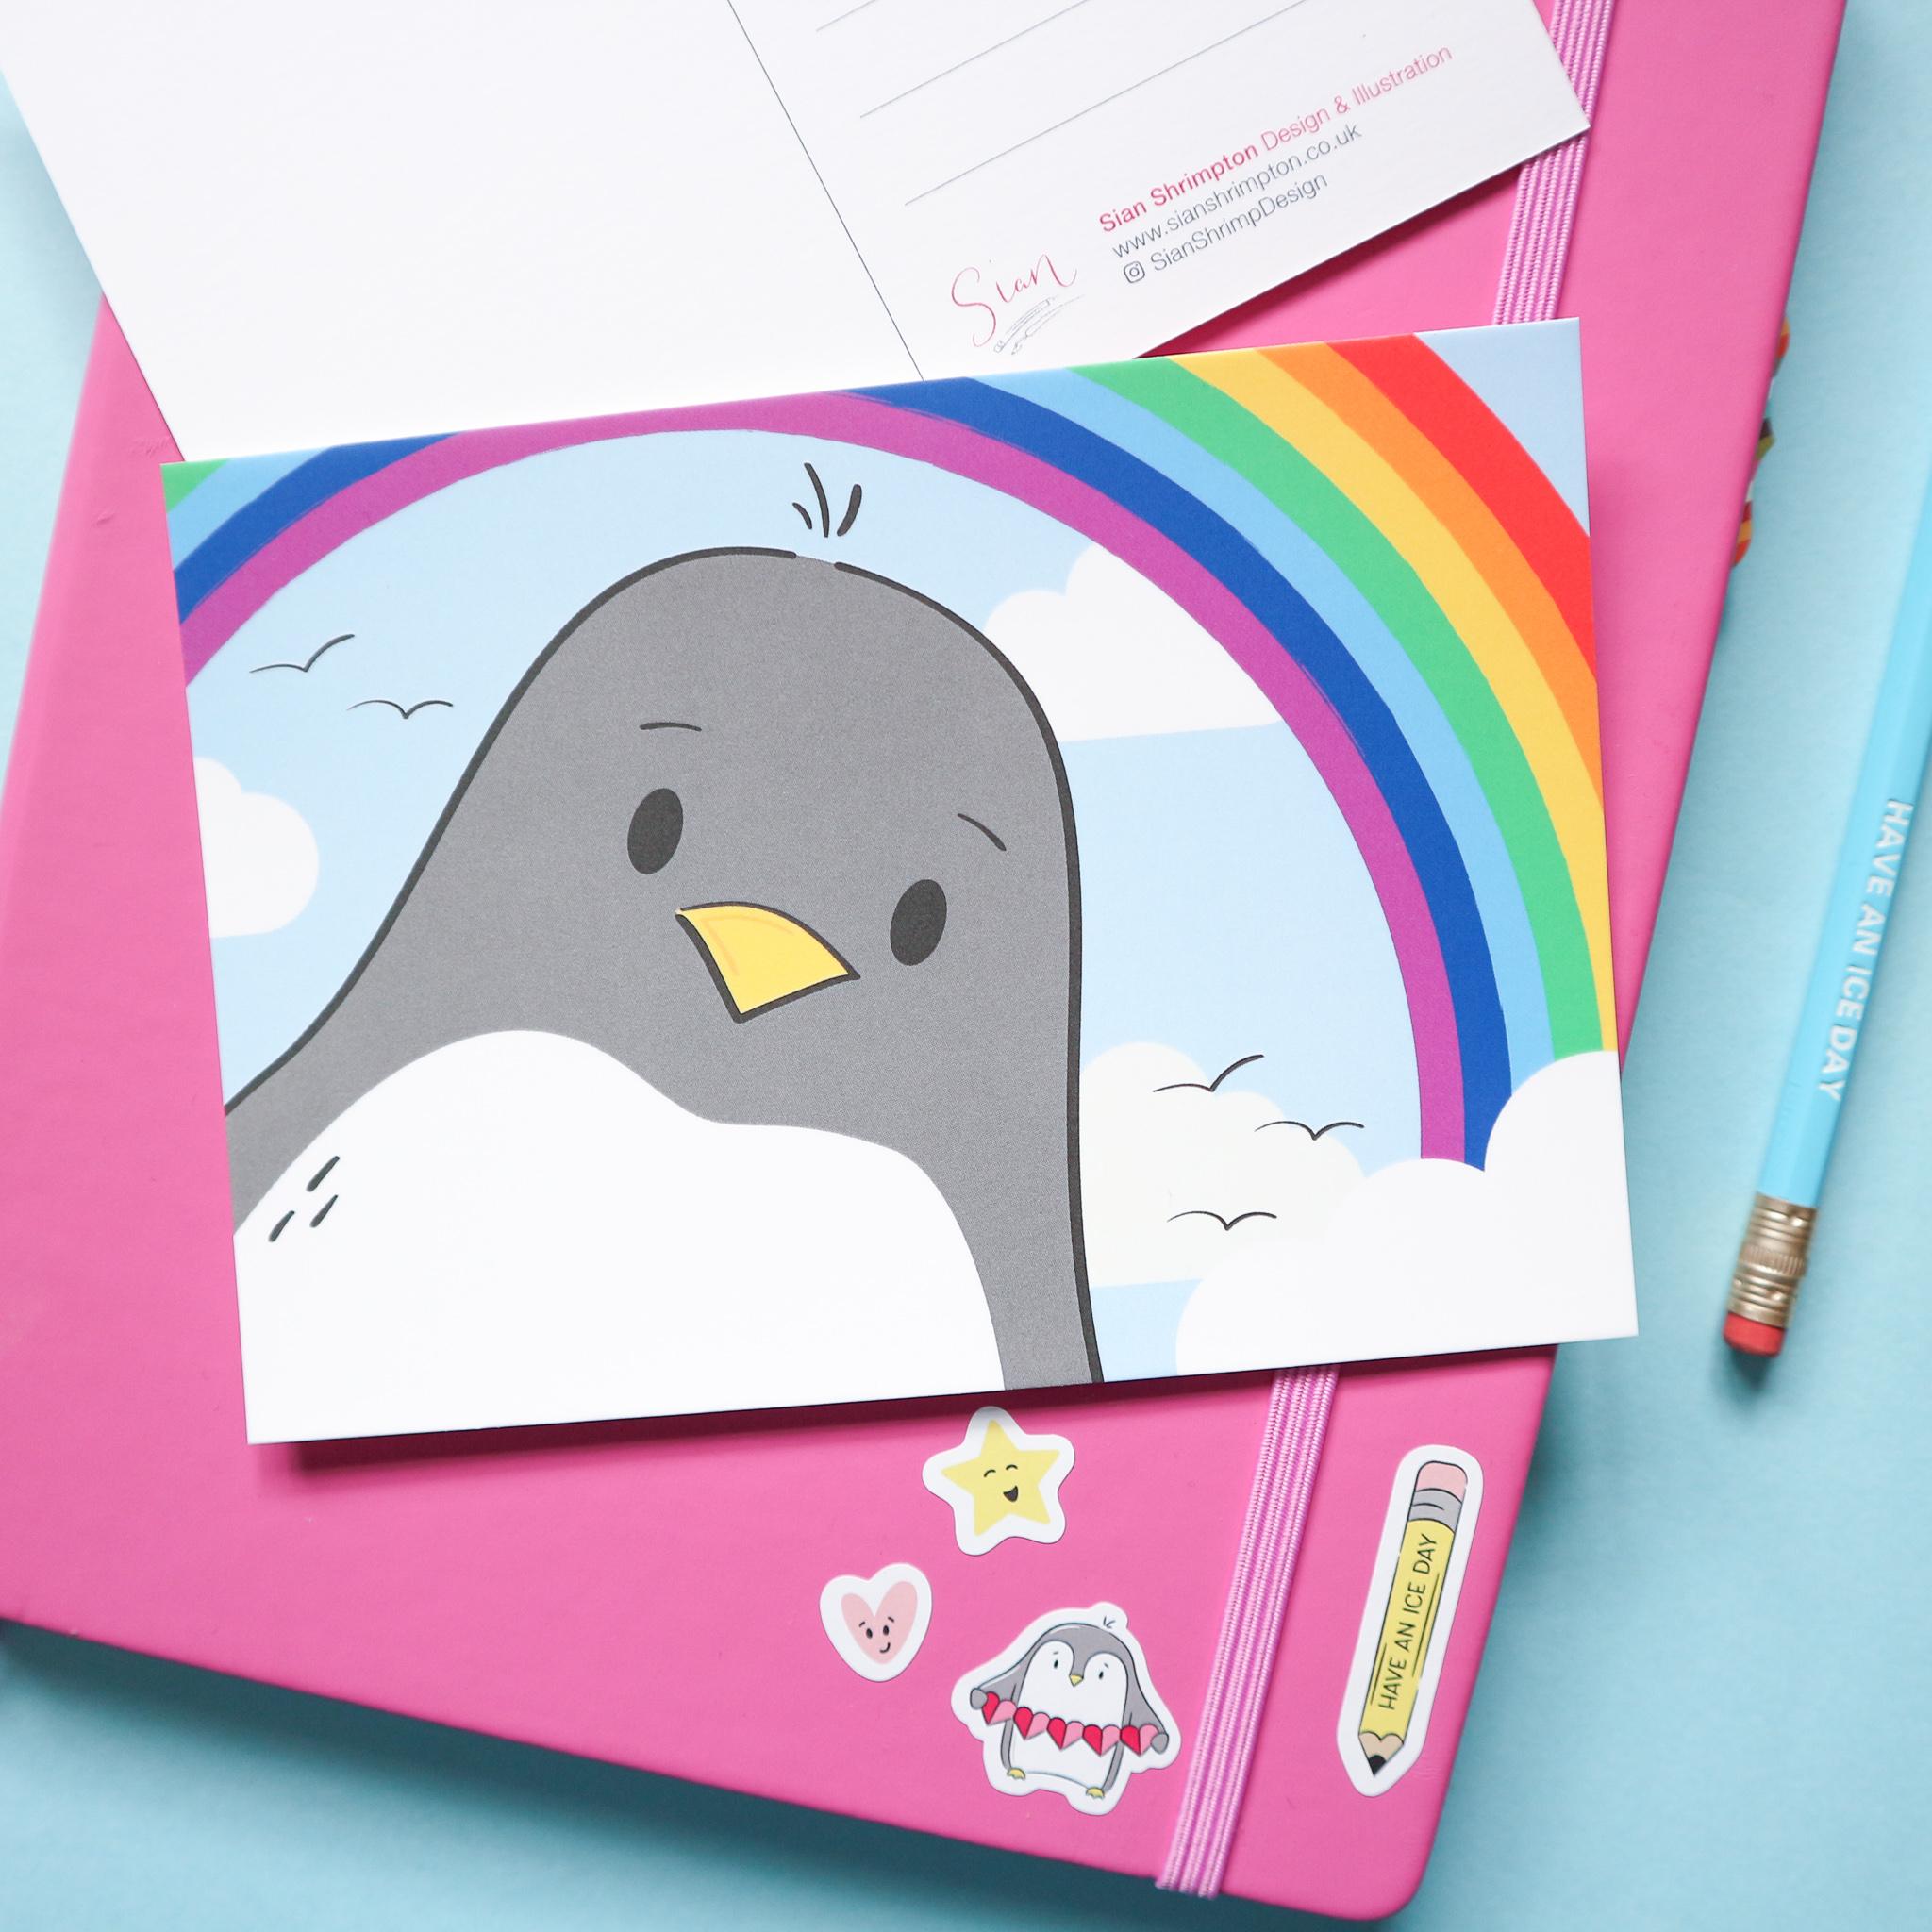 Penguin Rainbow Postcard Design by Sian Shrimpton